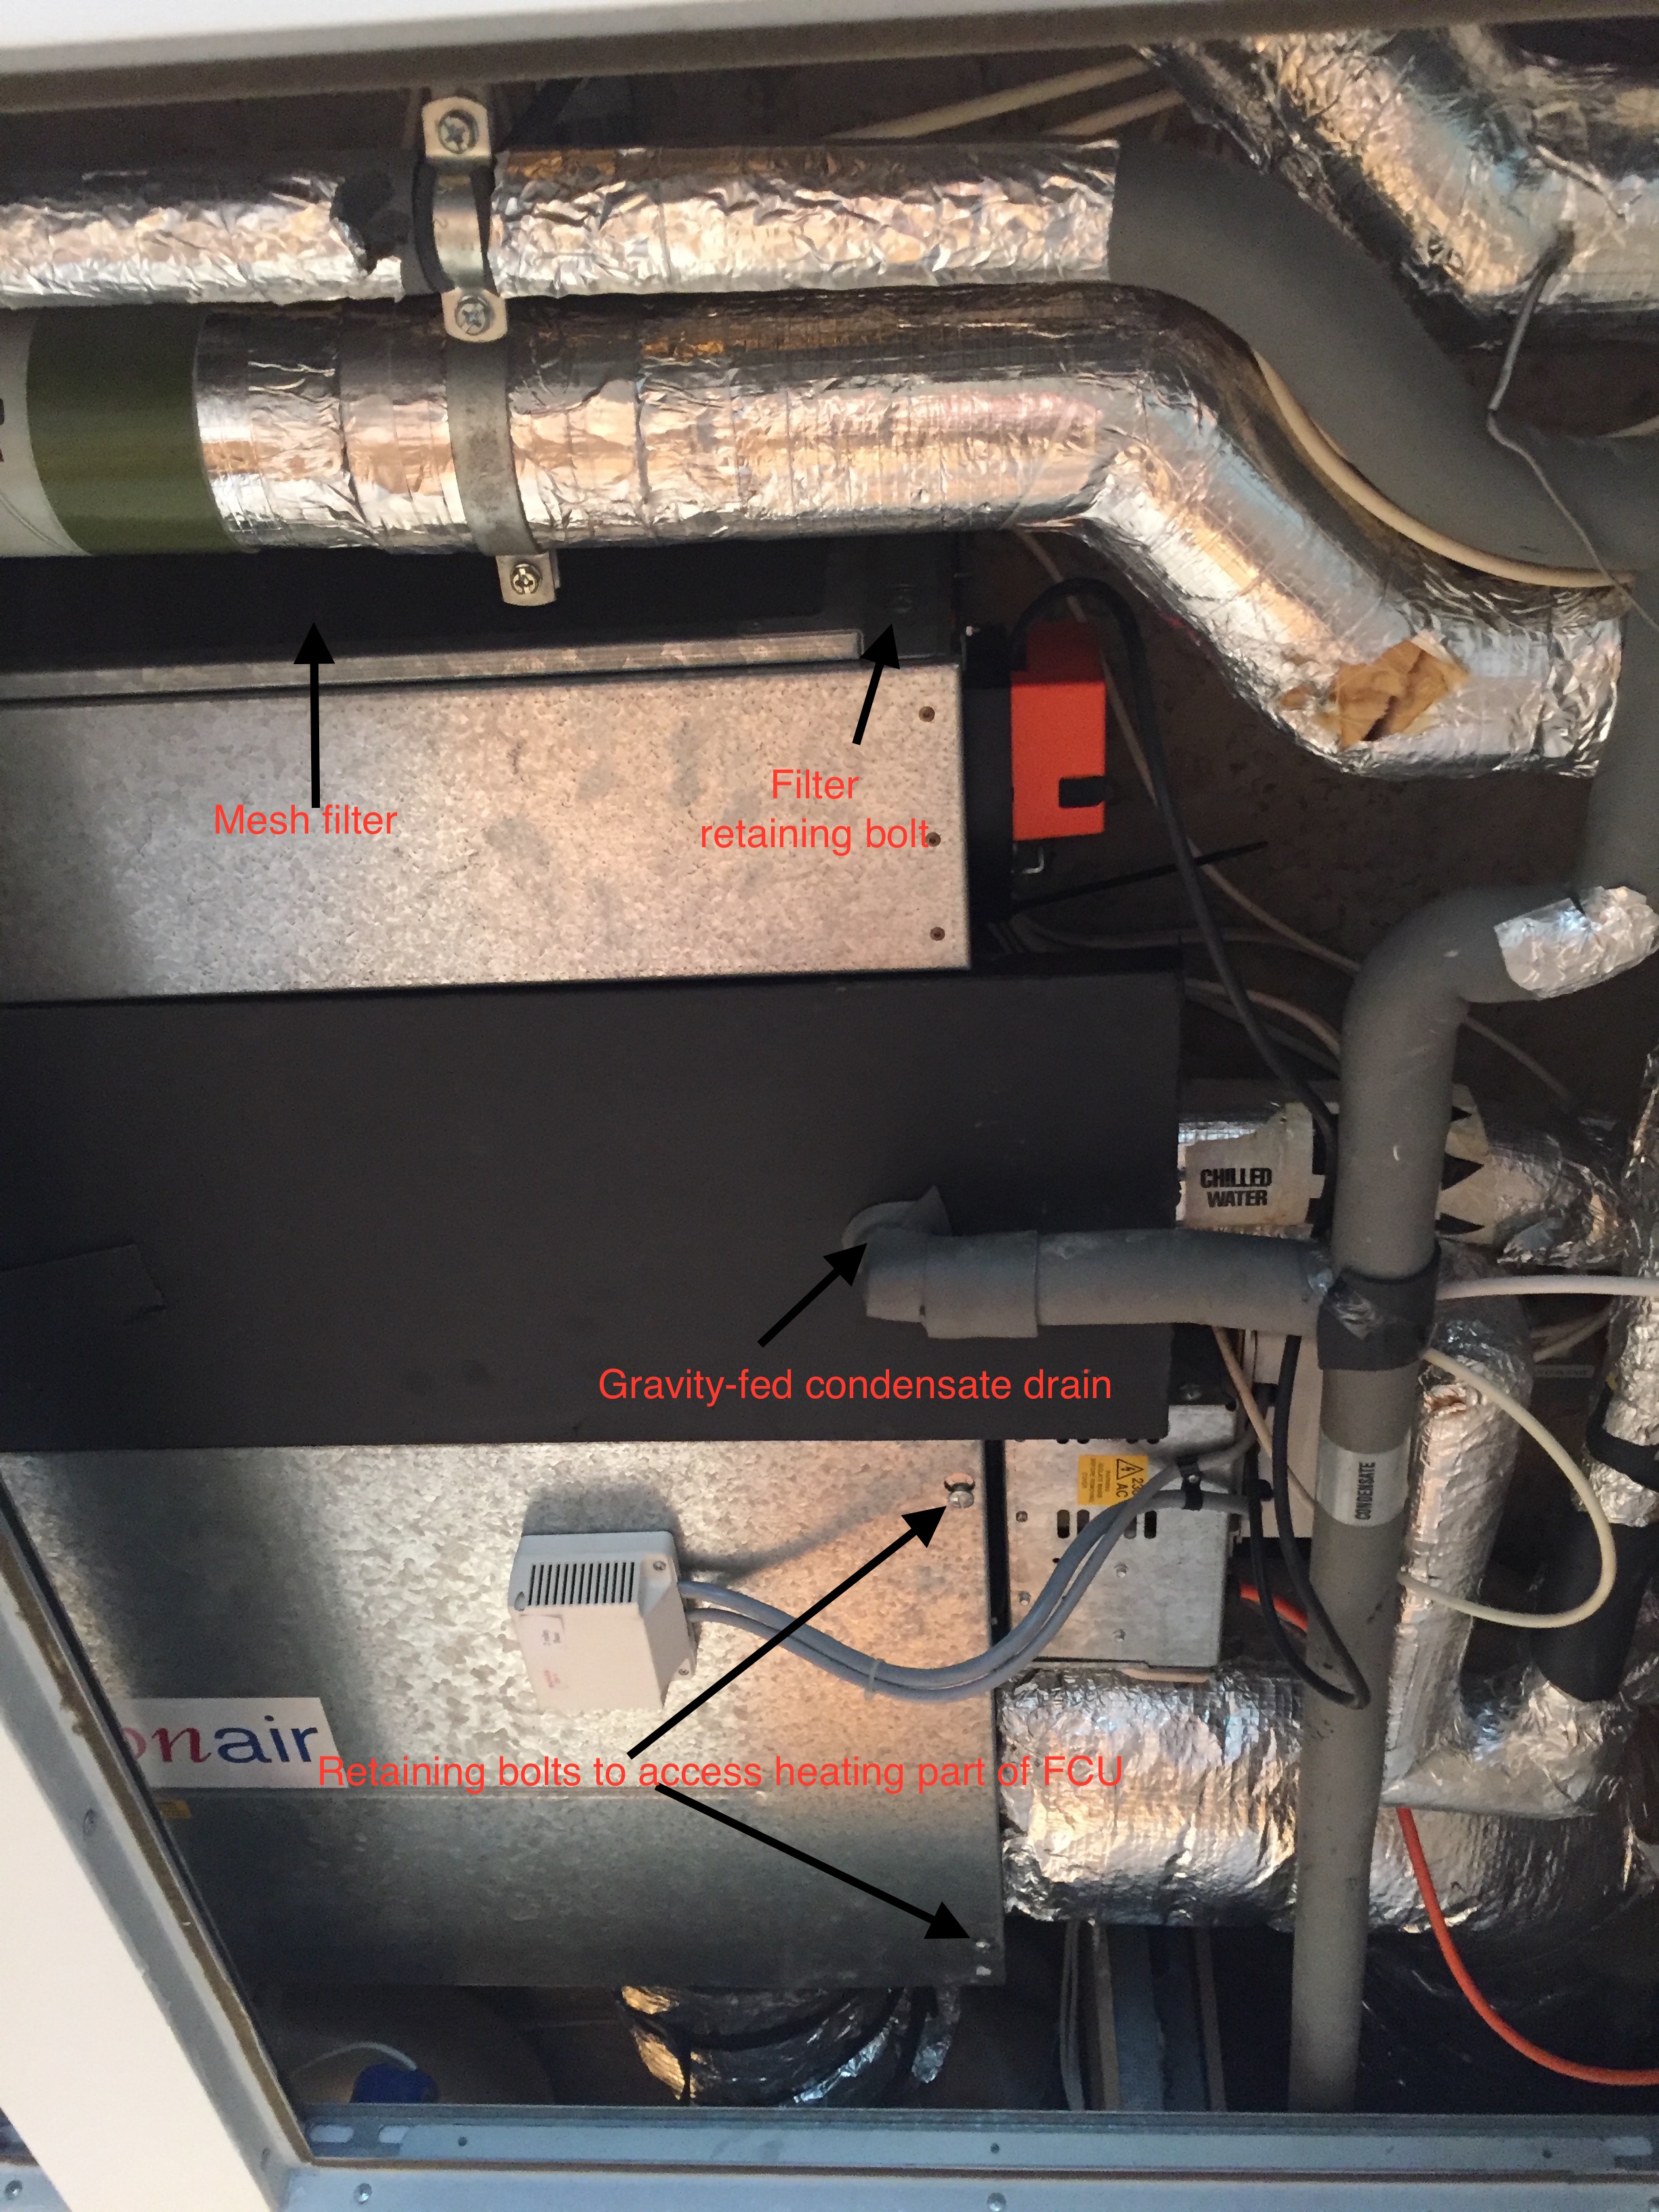 view of an fcu through an open ceiling panel